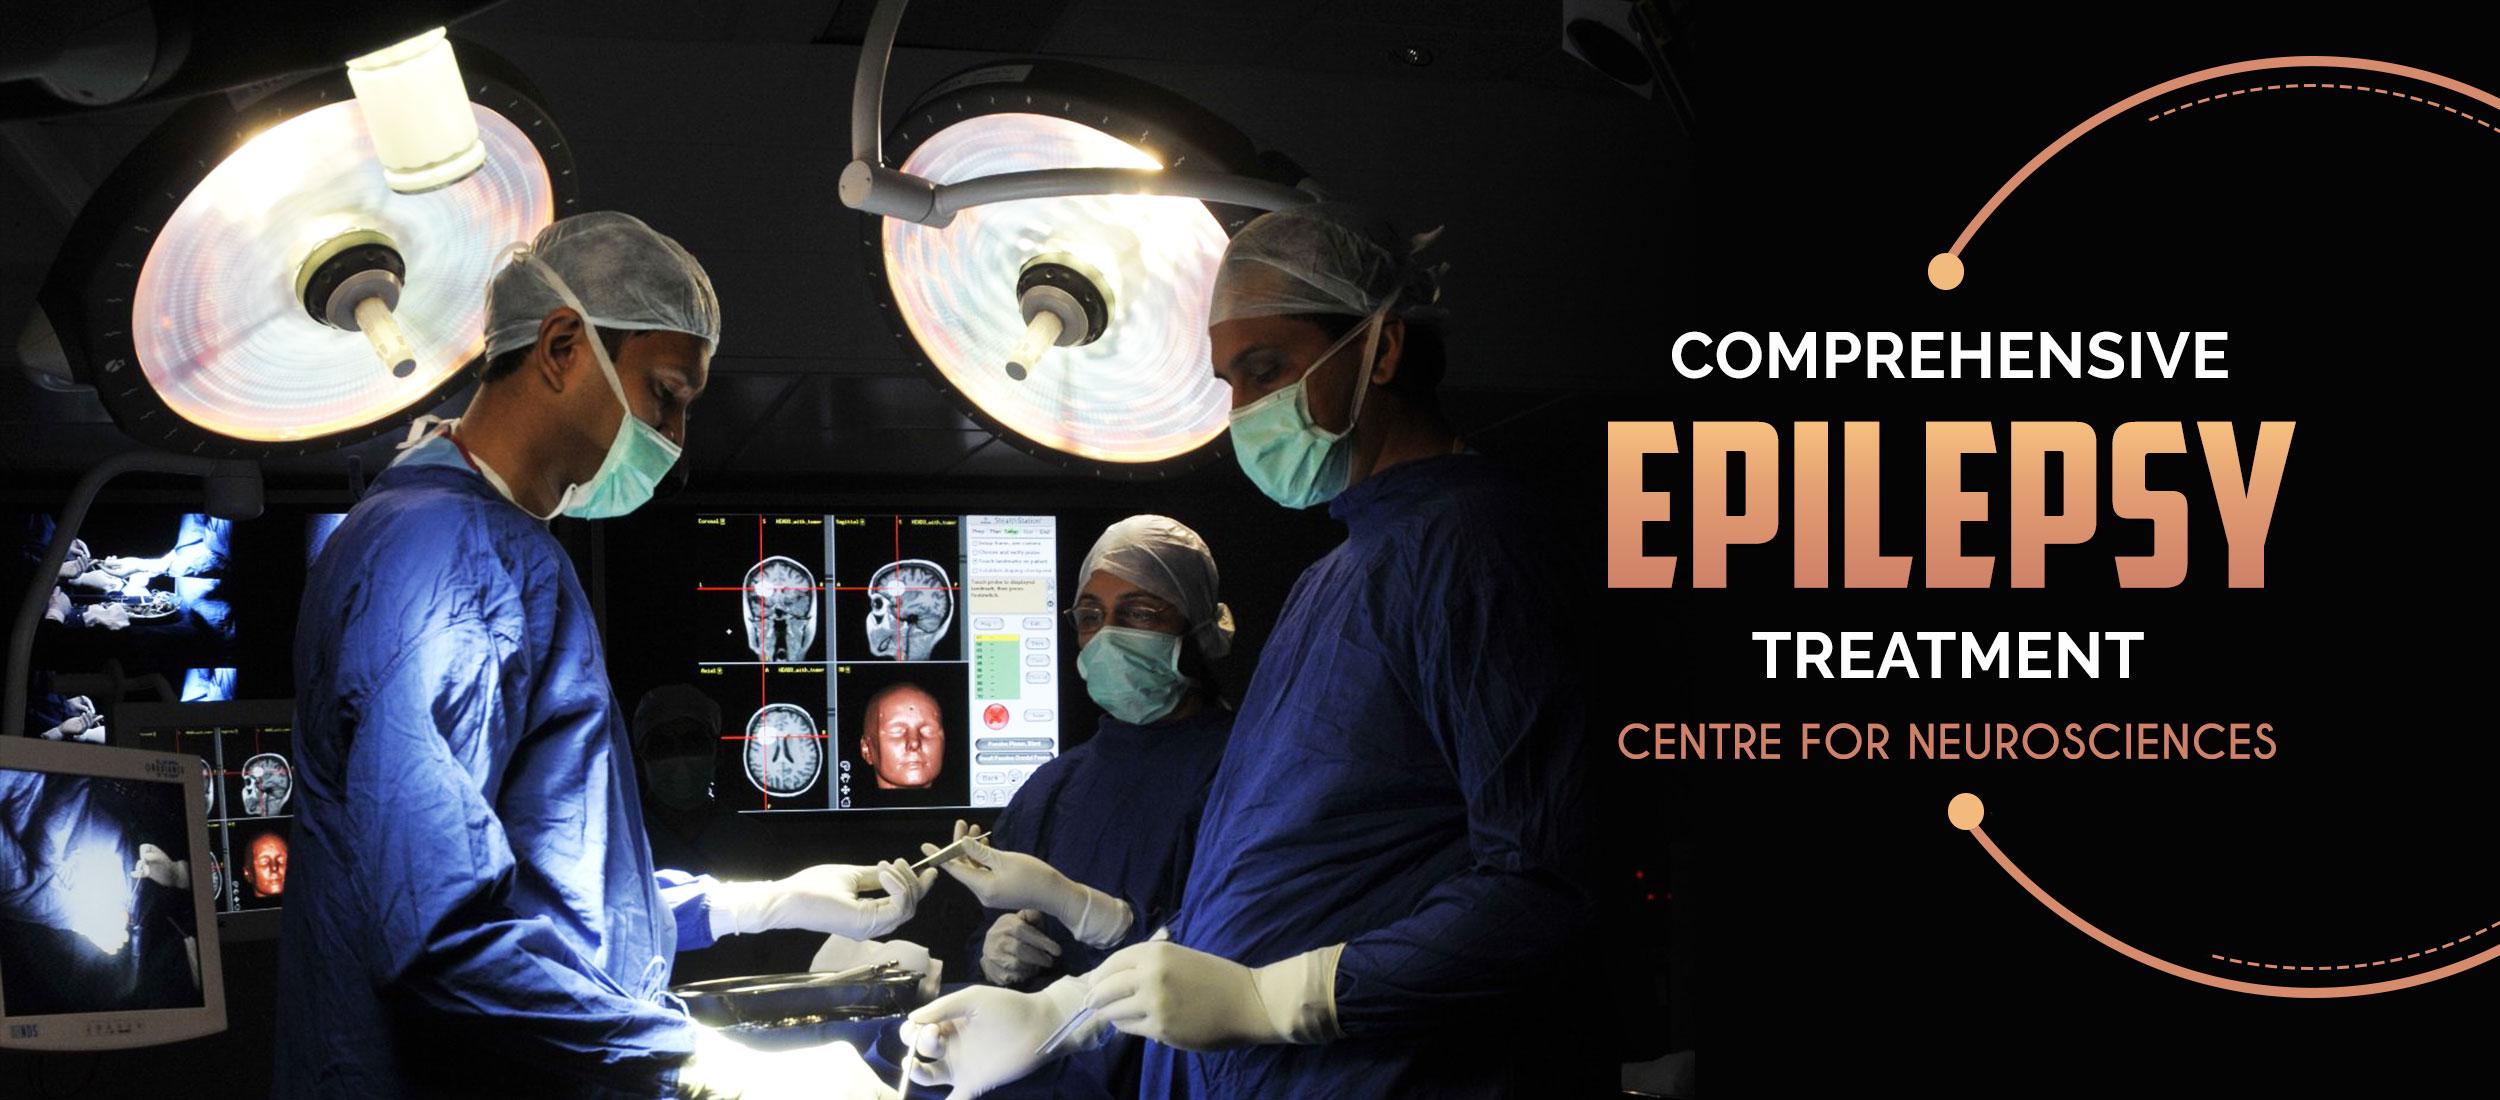 KDAH - Epilepsy Treatment Center For Neurosciences